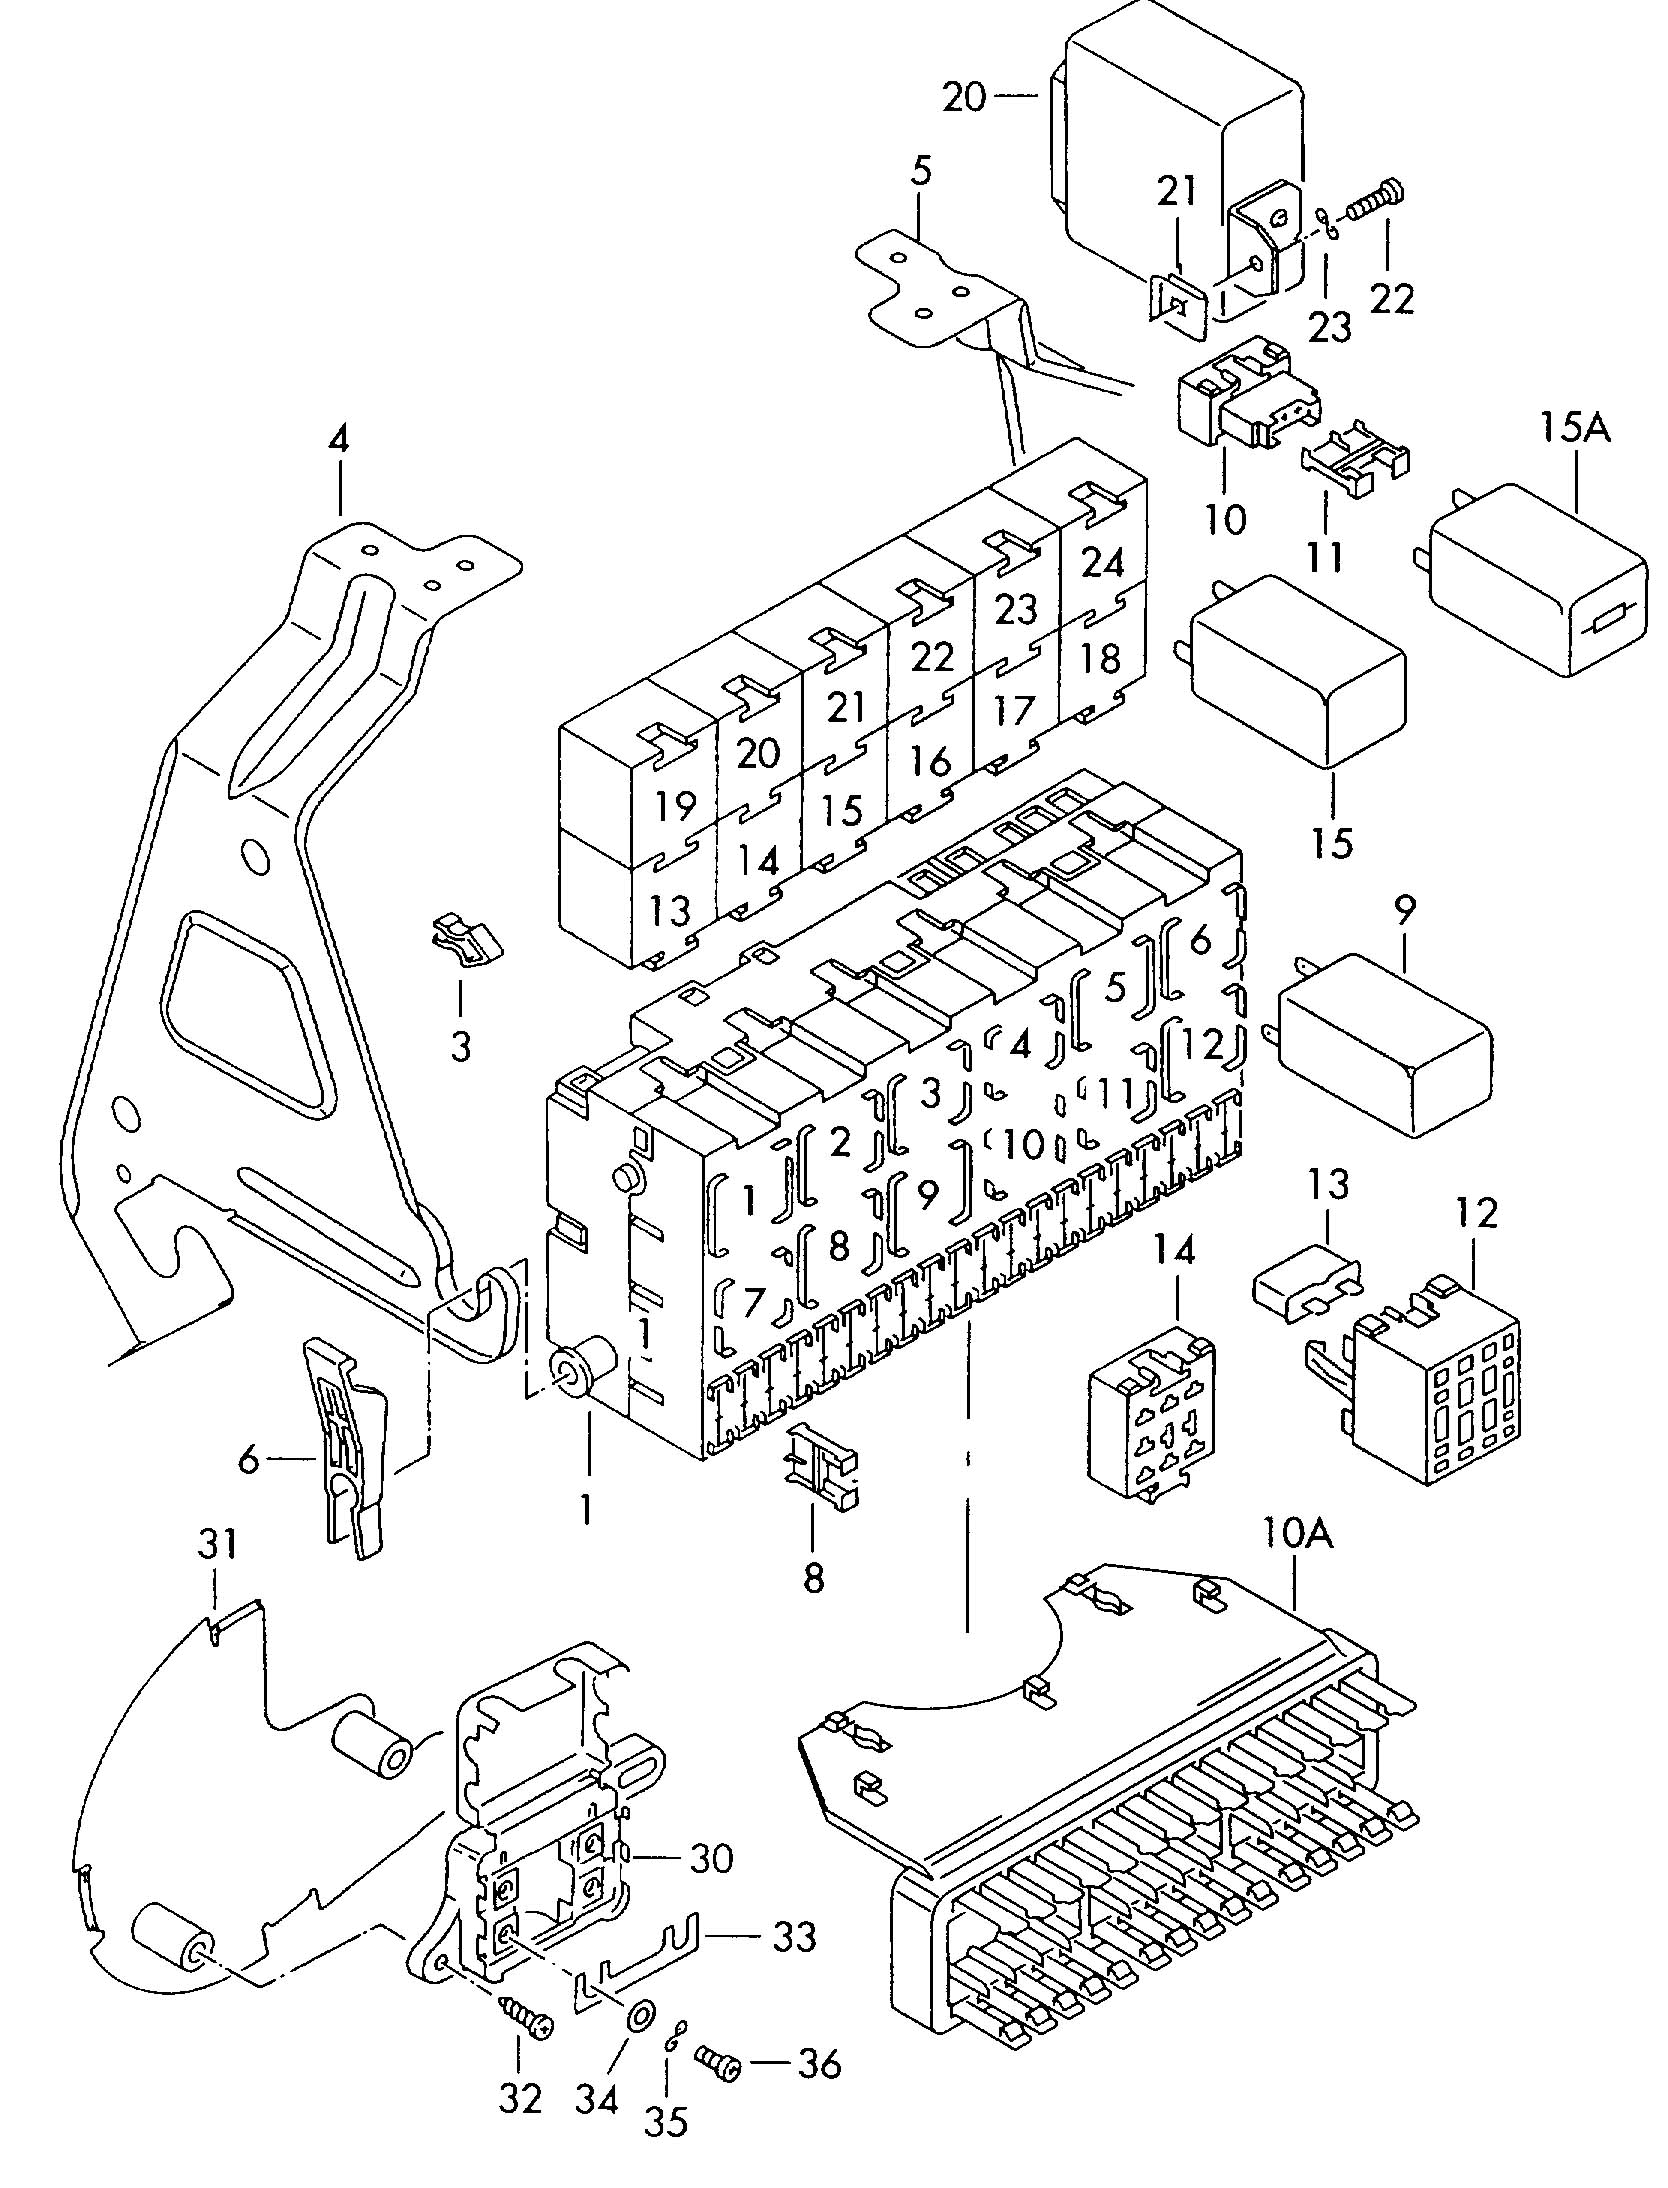 2002 vw passat fuse diagram american standard stratocaster wiring eurovan auto